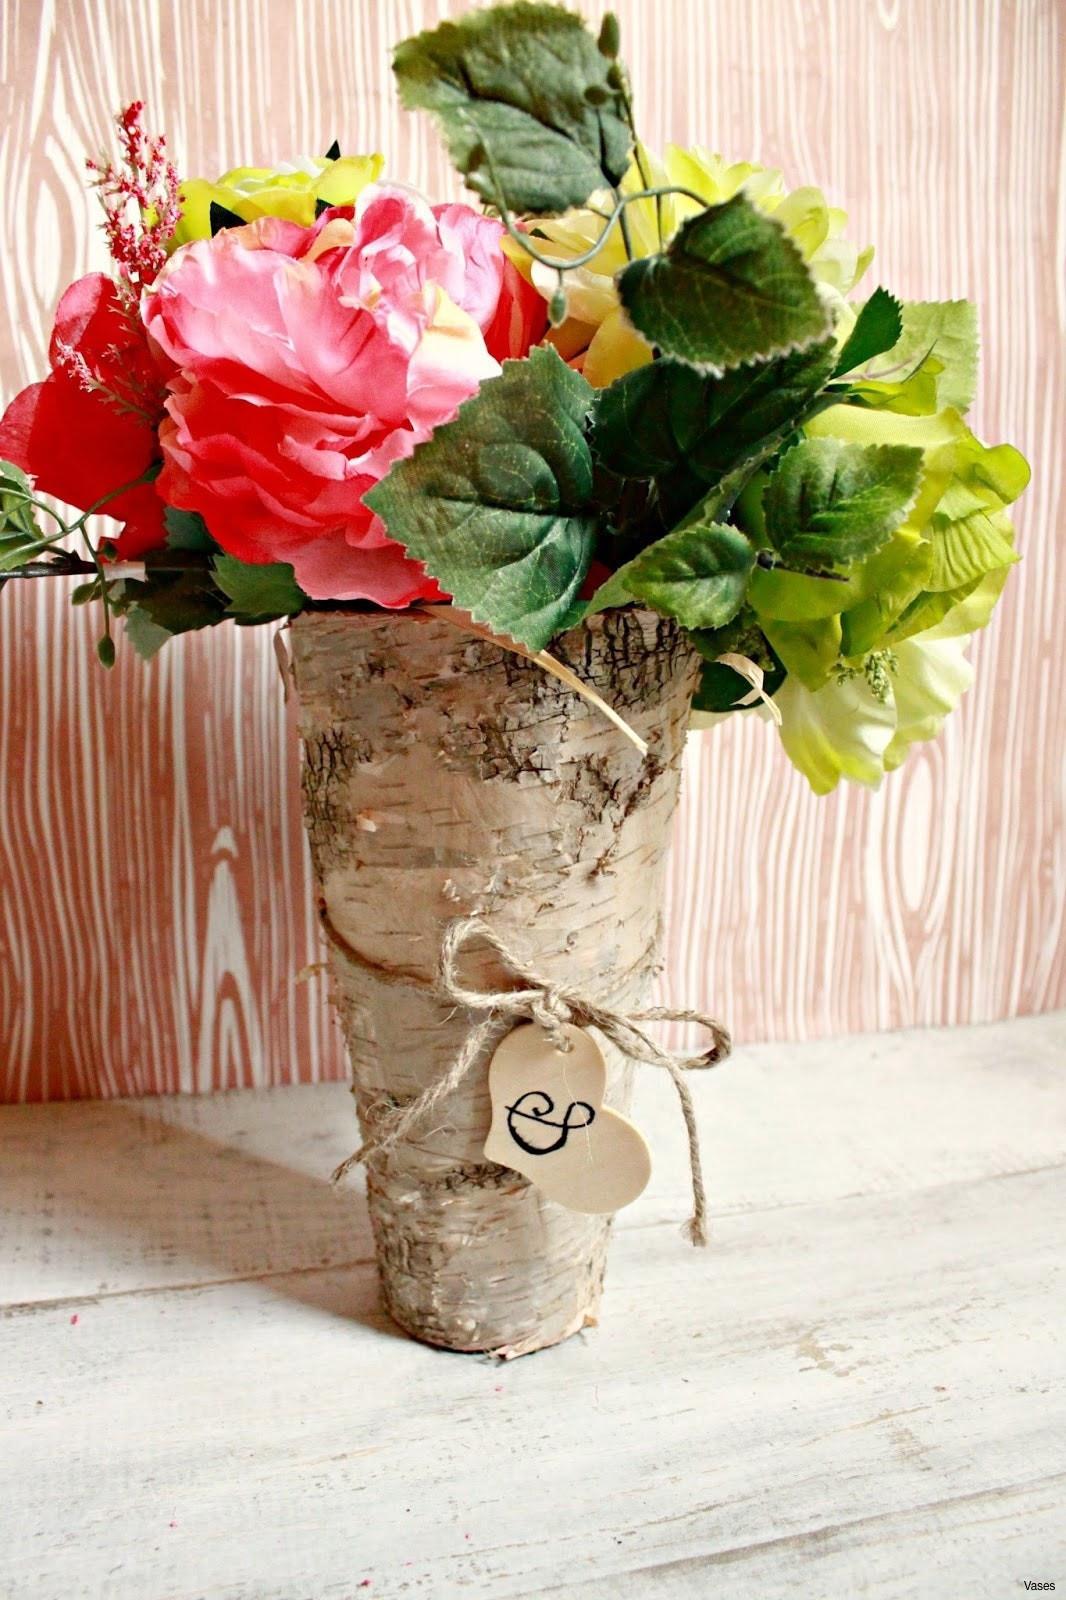 mango wood vase thailand of photograph of small wooden vase vases artificial plants collection pertaining to elegant flower arrangements diy h vases diy wood vase i 0d base